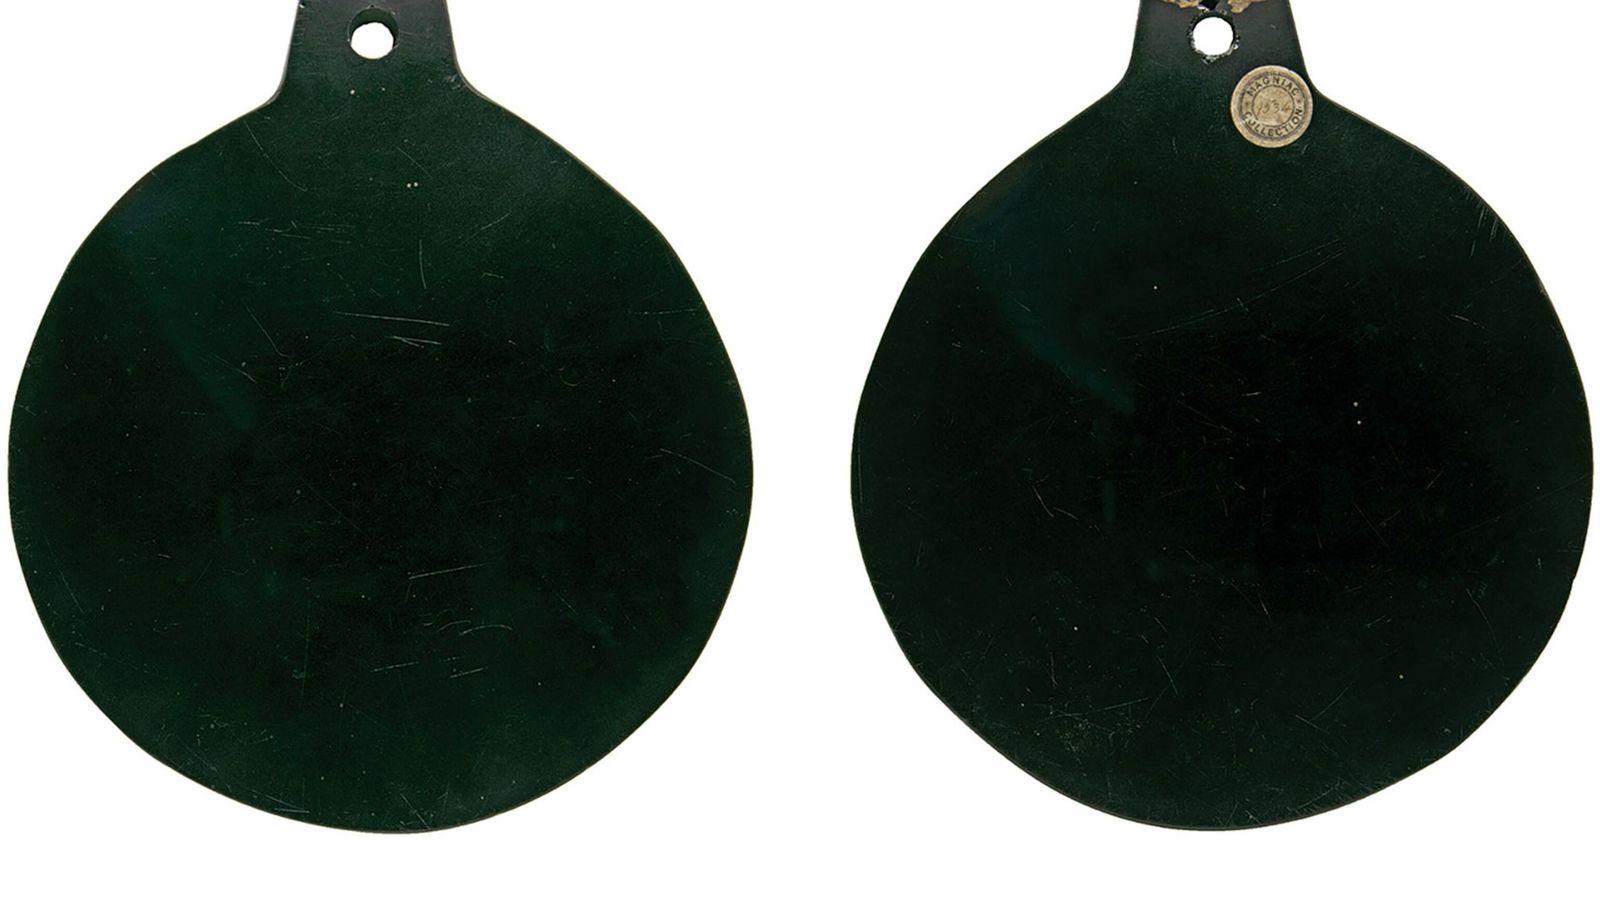 01-obsidian-mirror